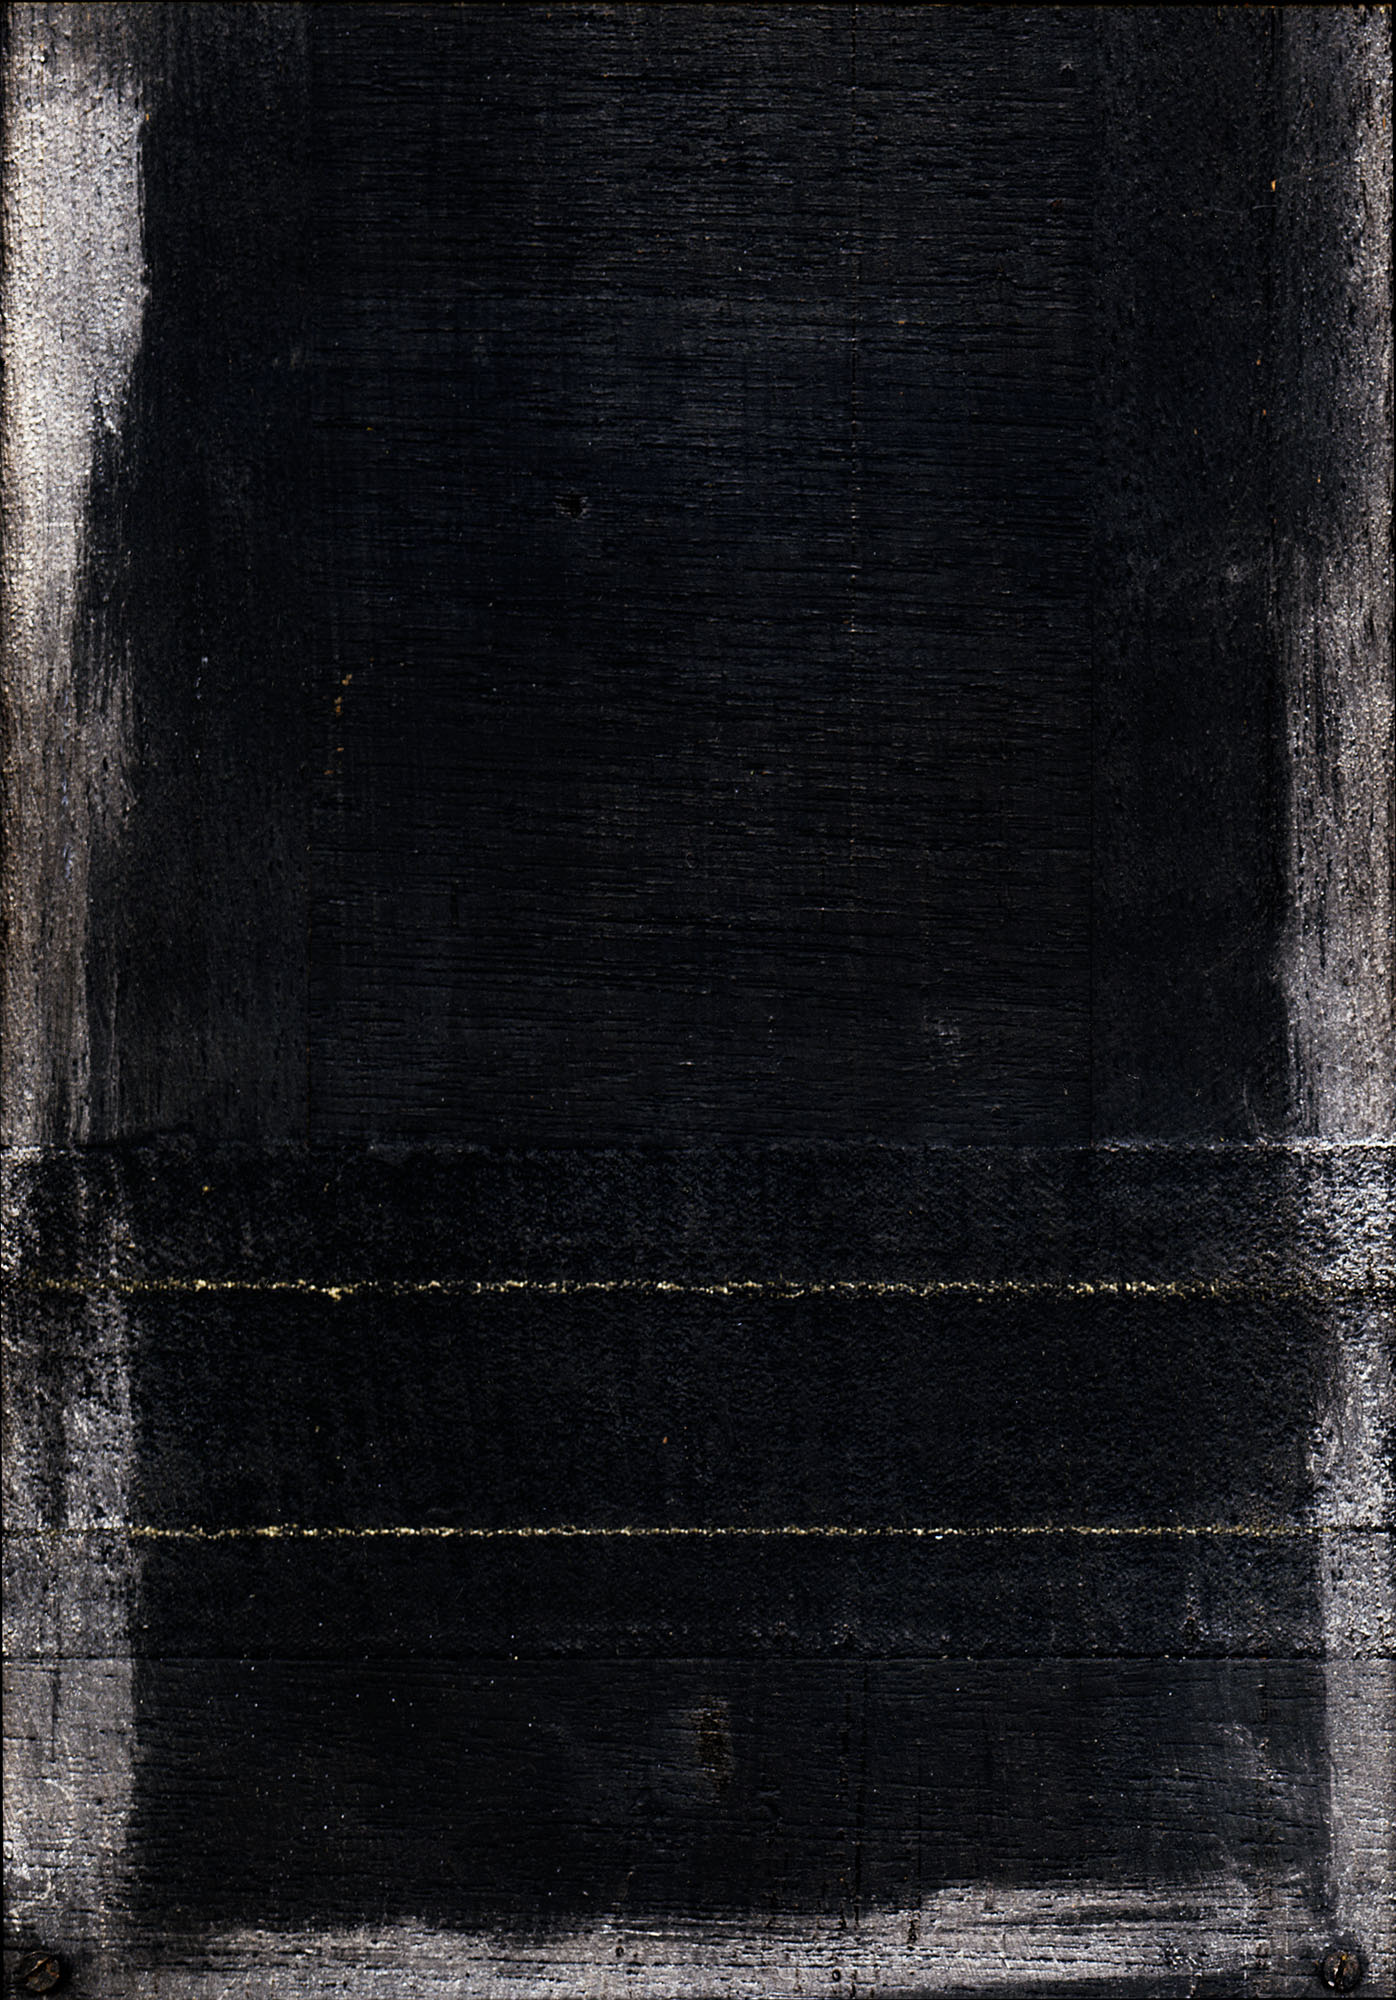 'Exposed' (2018)